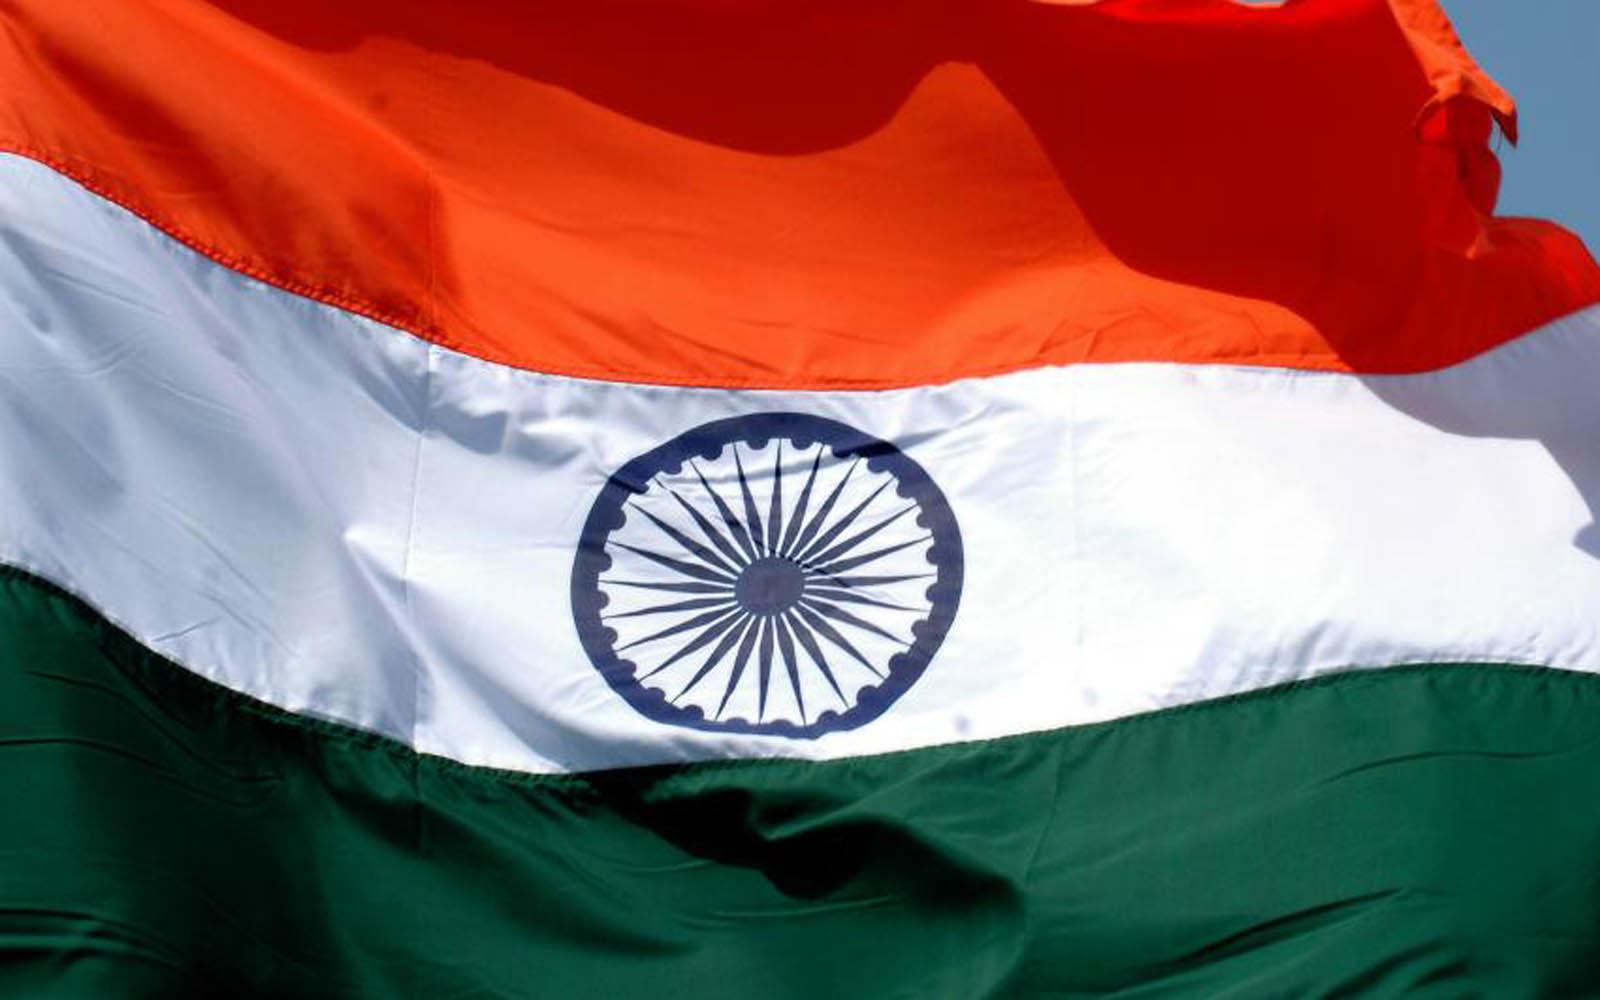 indian flag wallpapers india hd tricolor bollywood independence tiranga hindi national patriotic nation